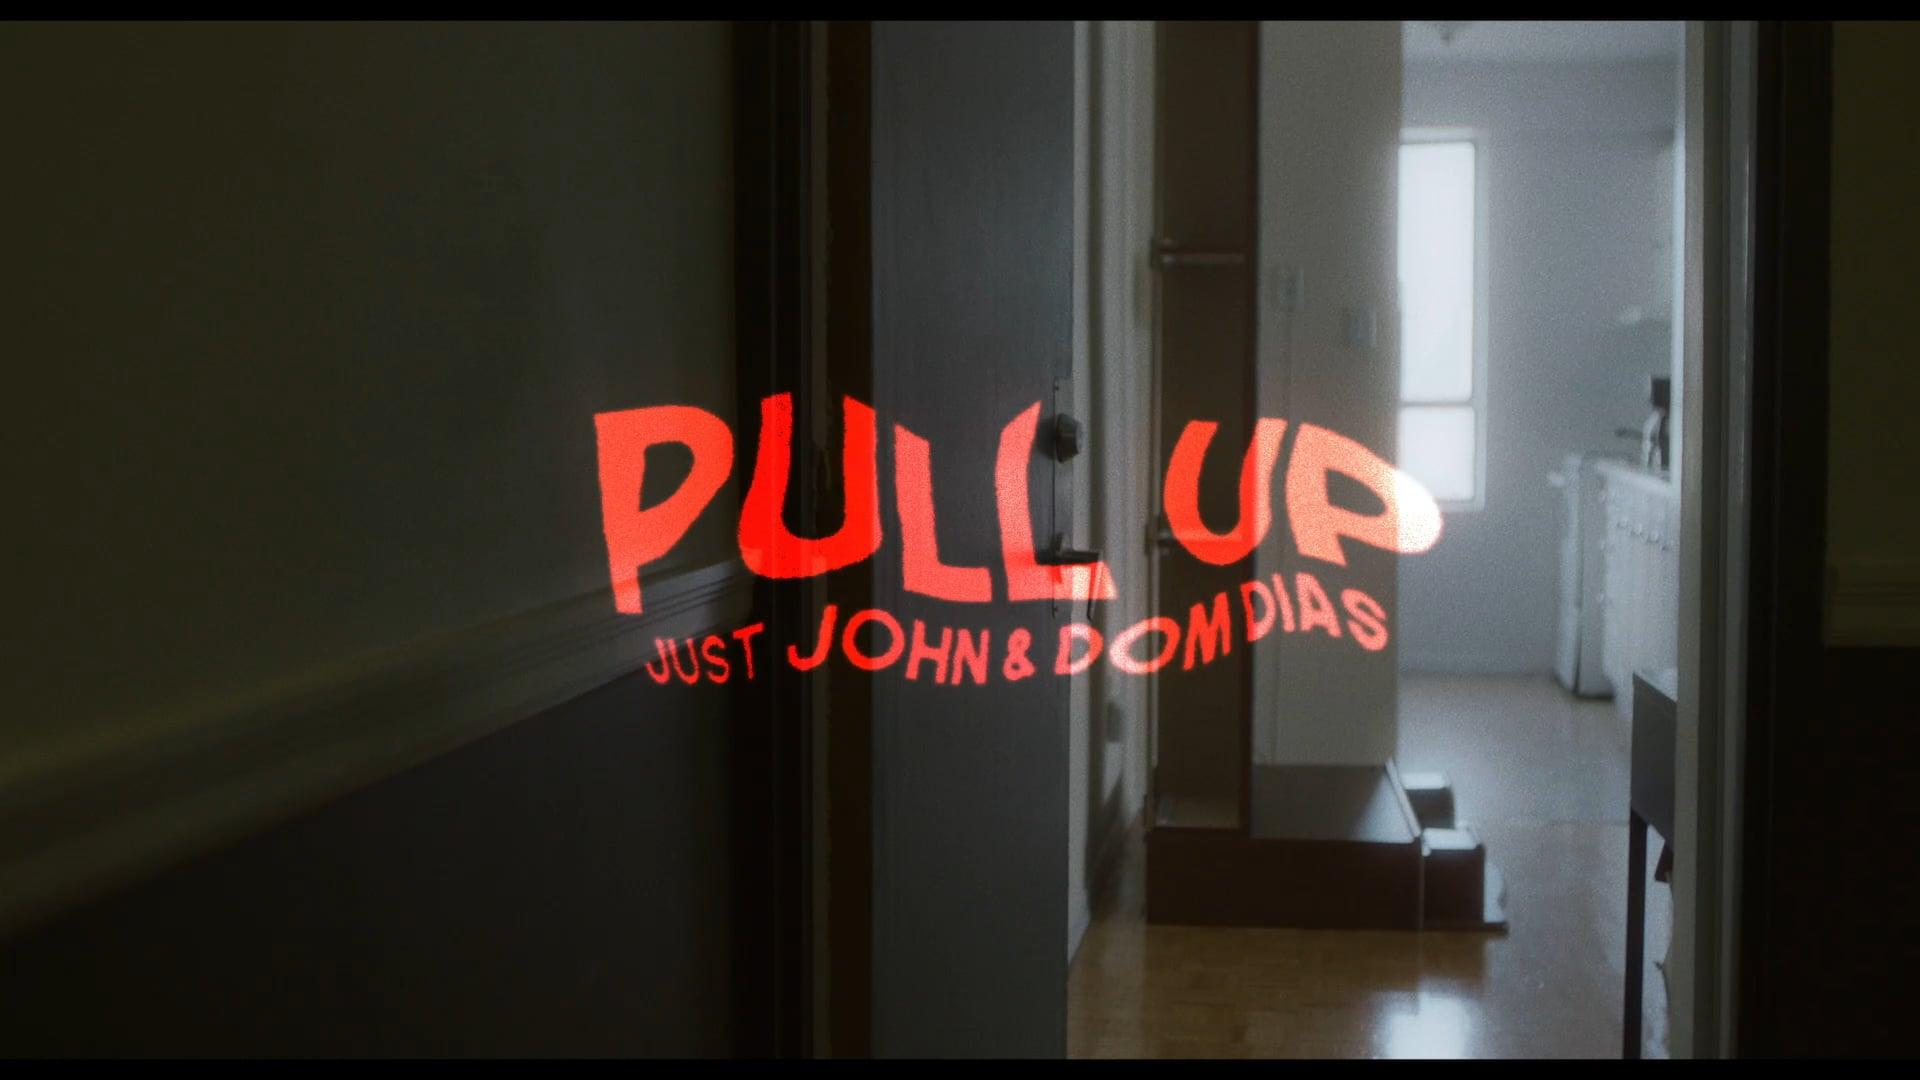 Just John x Dom Dias - Pull Up